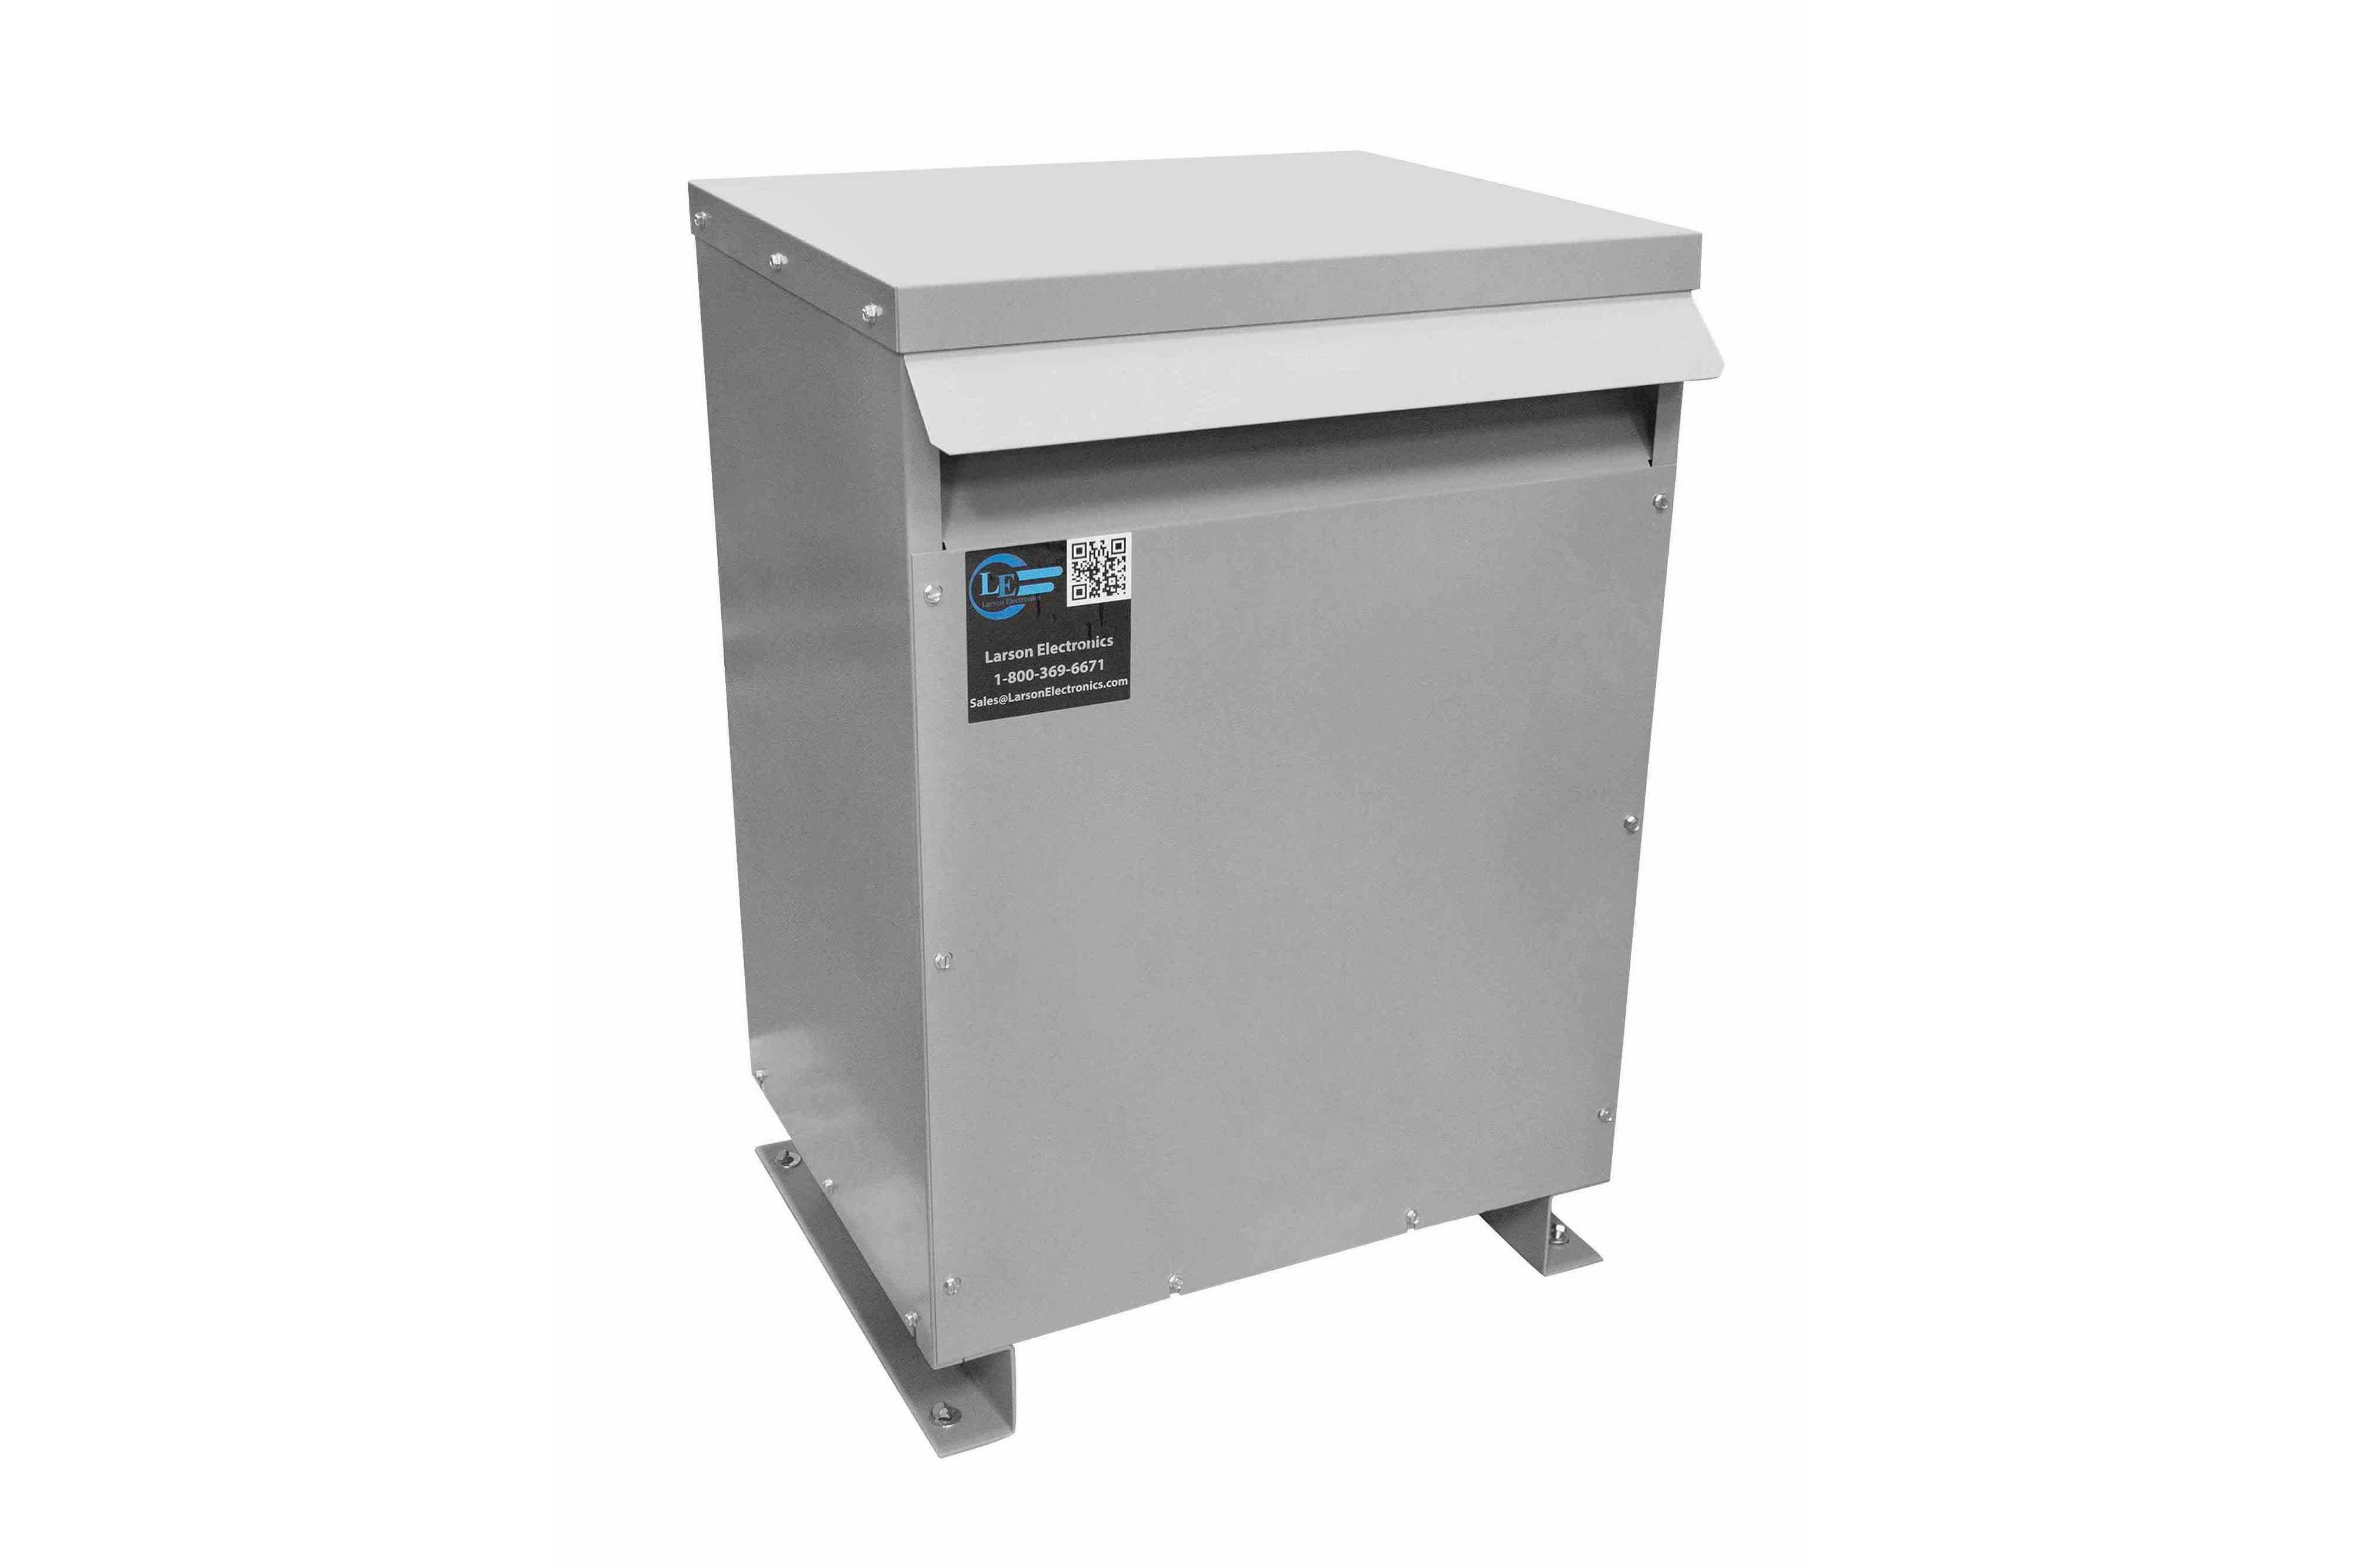 18 kVA 3PH Isolation Transformer, 575V Wye Primary, 208Y/120 Wye-N Secondary, N3R, Ventilated, 60 Hz